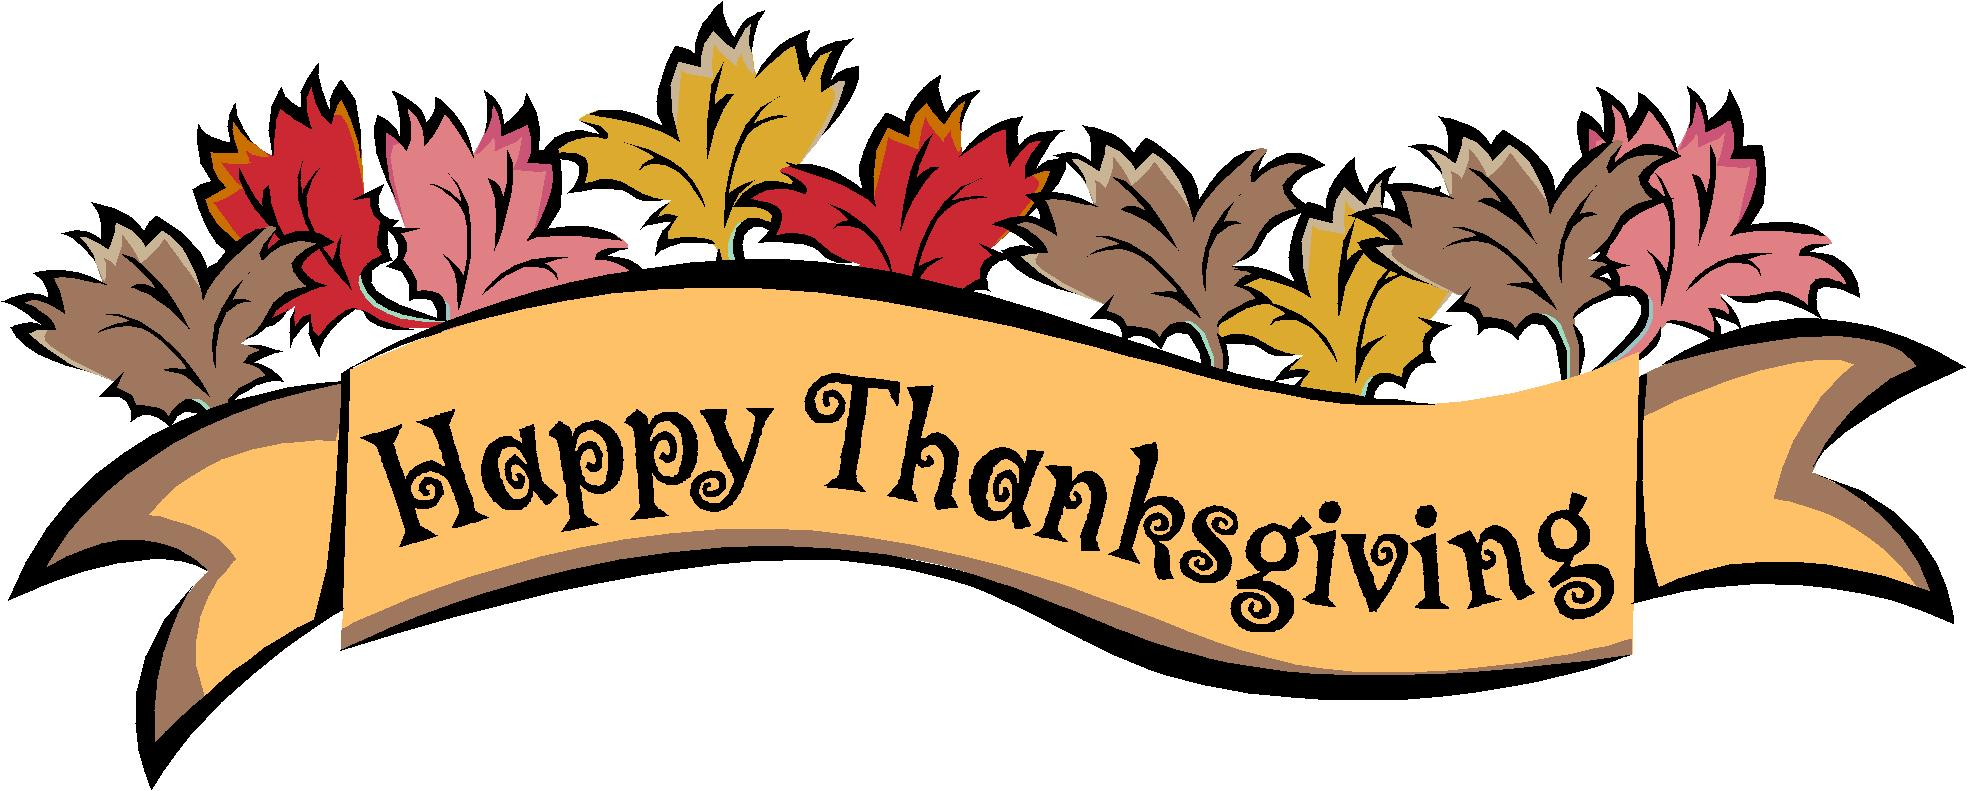 super hd thanksgiving image